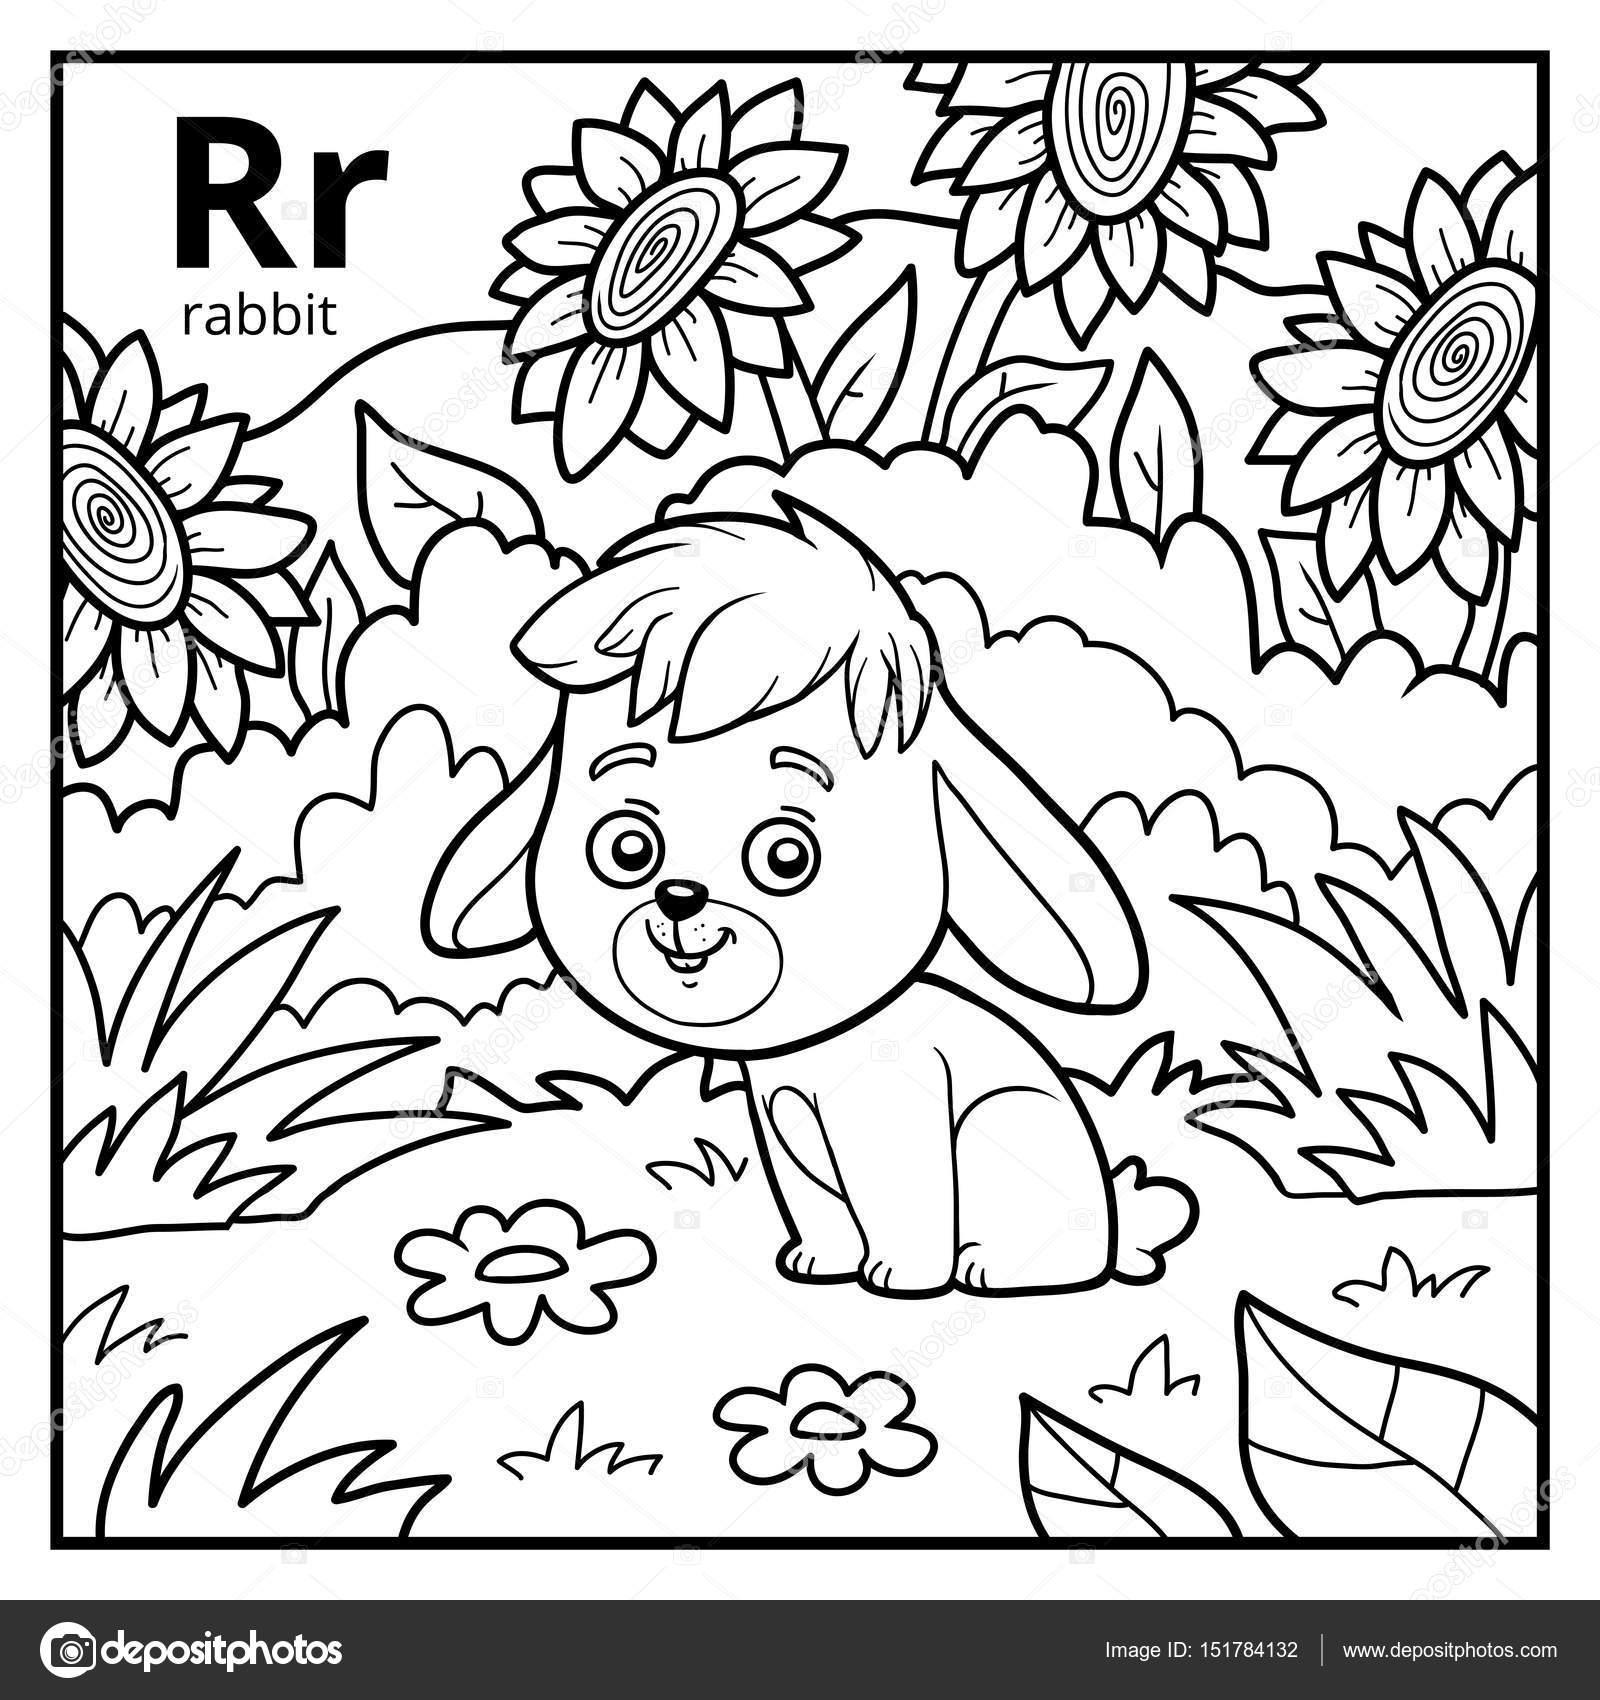 Libro para colorear, alfabeto descolorido. Letra R, conejo — Vector ...